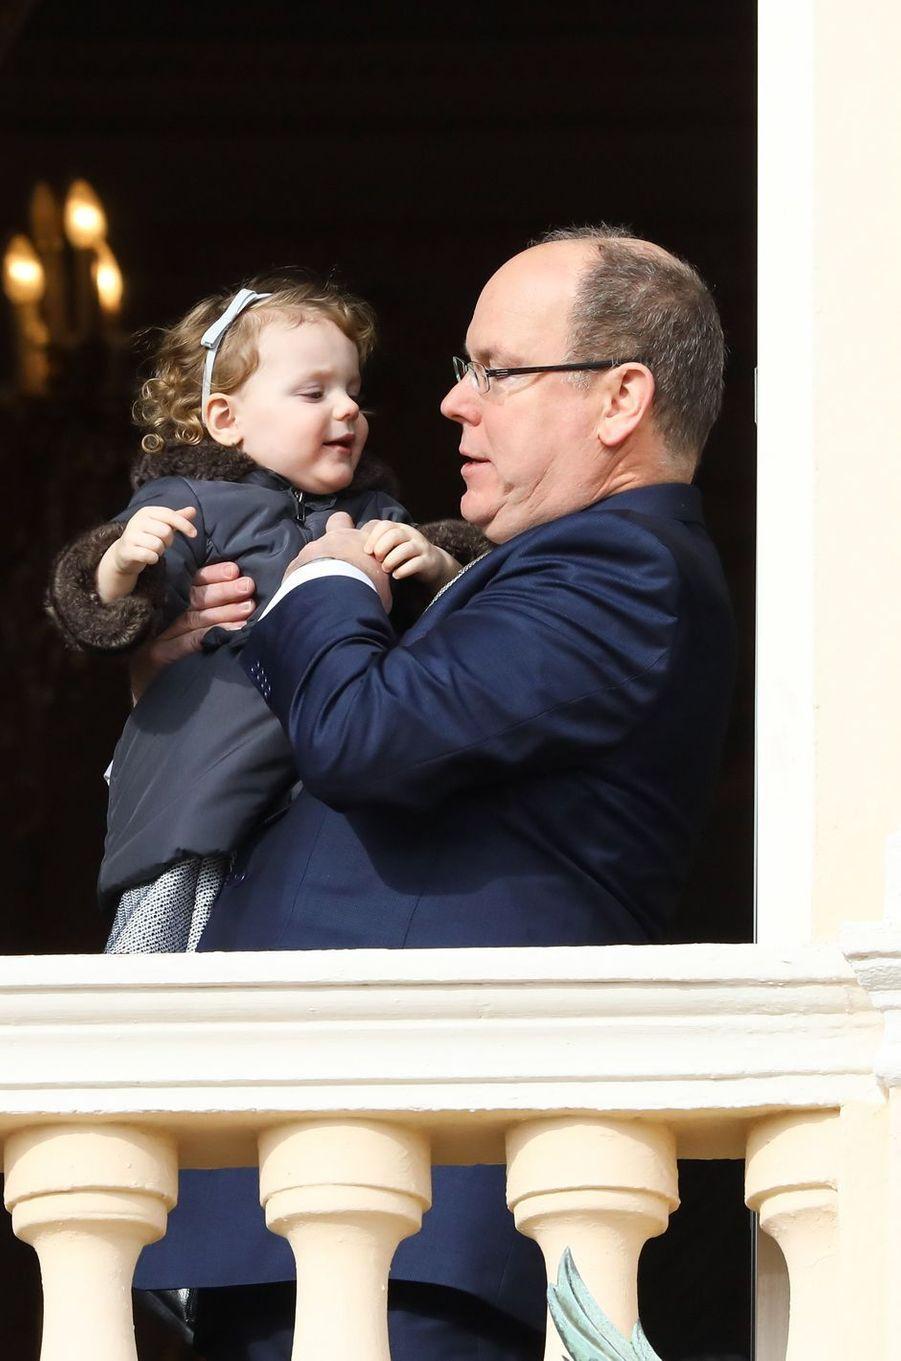 Le prince Albert II de Monaco avec la princesse Gabriella à Monaco le 27 janvier 2017